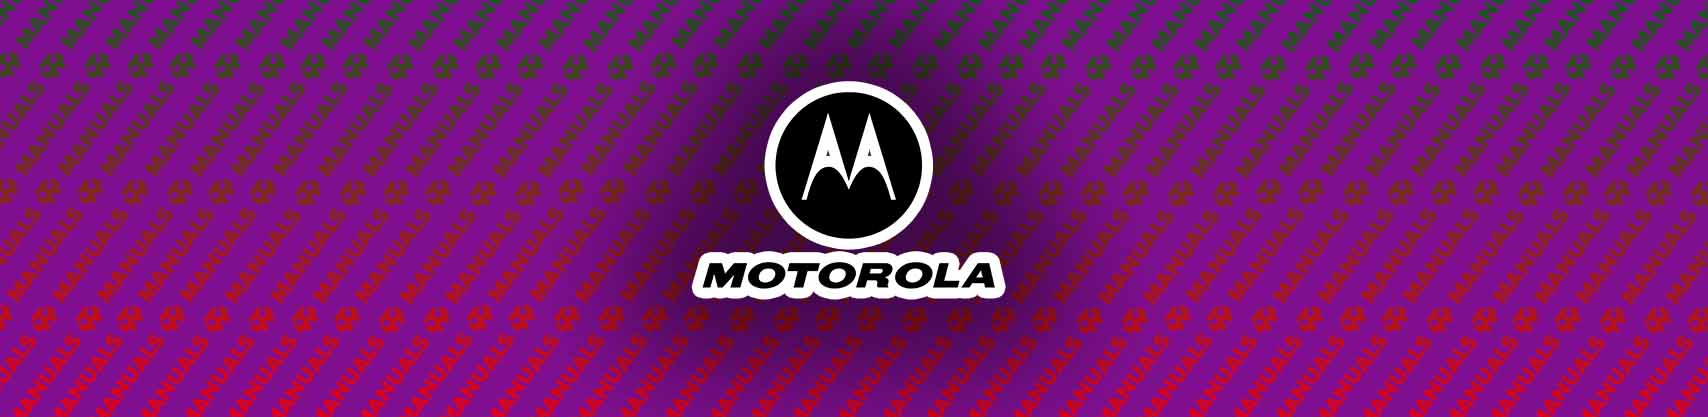 Motorola MG7540 Manual